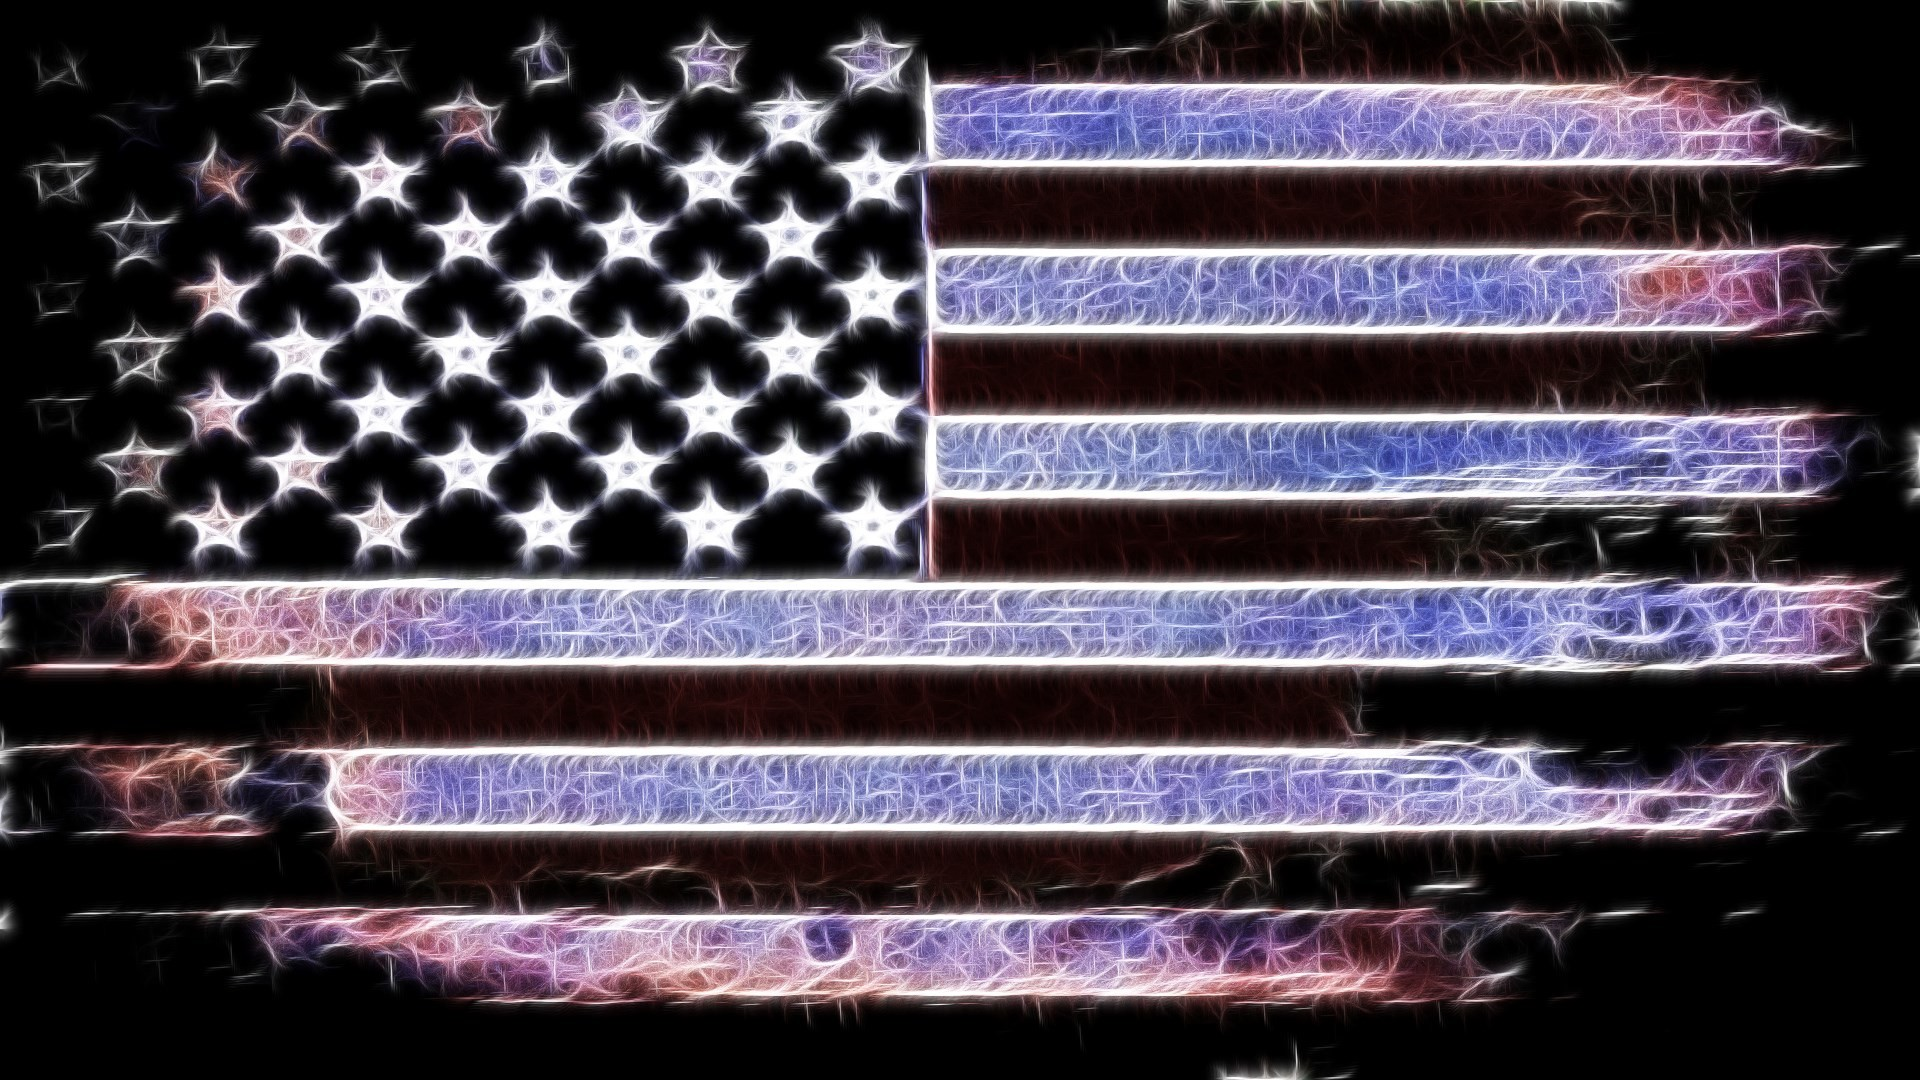 American Flag Wallpaper – HD Wallpapers 1080p   Wallpaper HD 1080p    Pinterest   American flag wallpaper, Wallpaper and Usa flag wallpaper